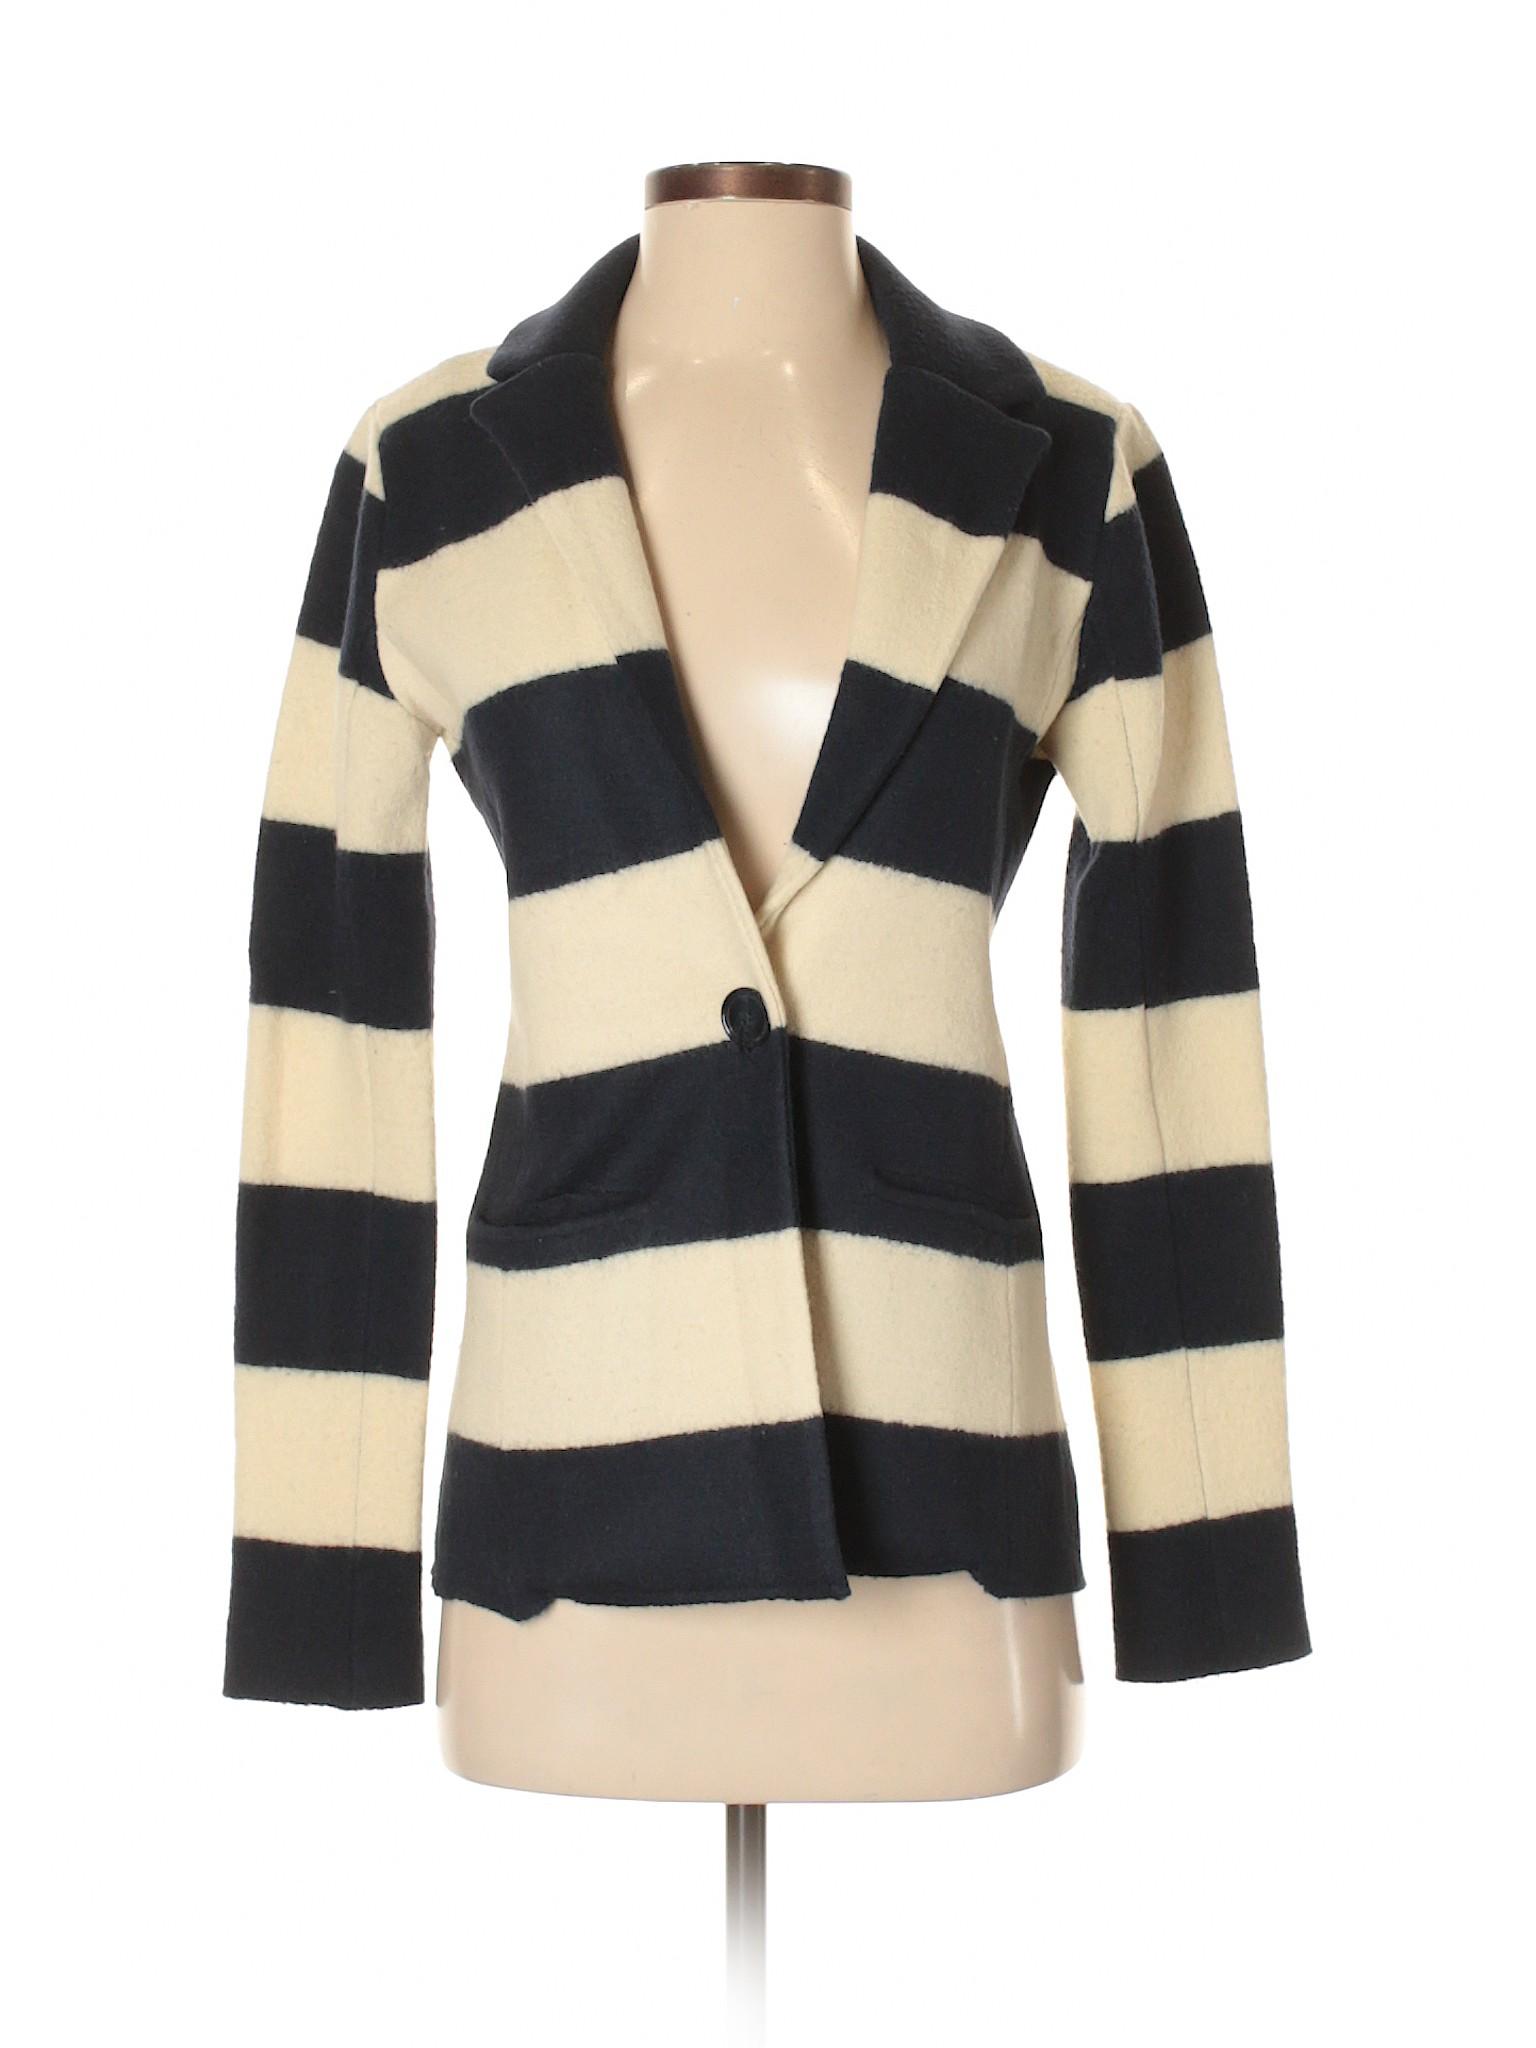 Wool Taylor Boutique leisure Blazer Ann LOFT qEE1vwzZI